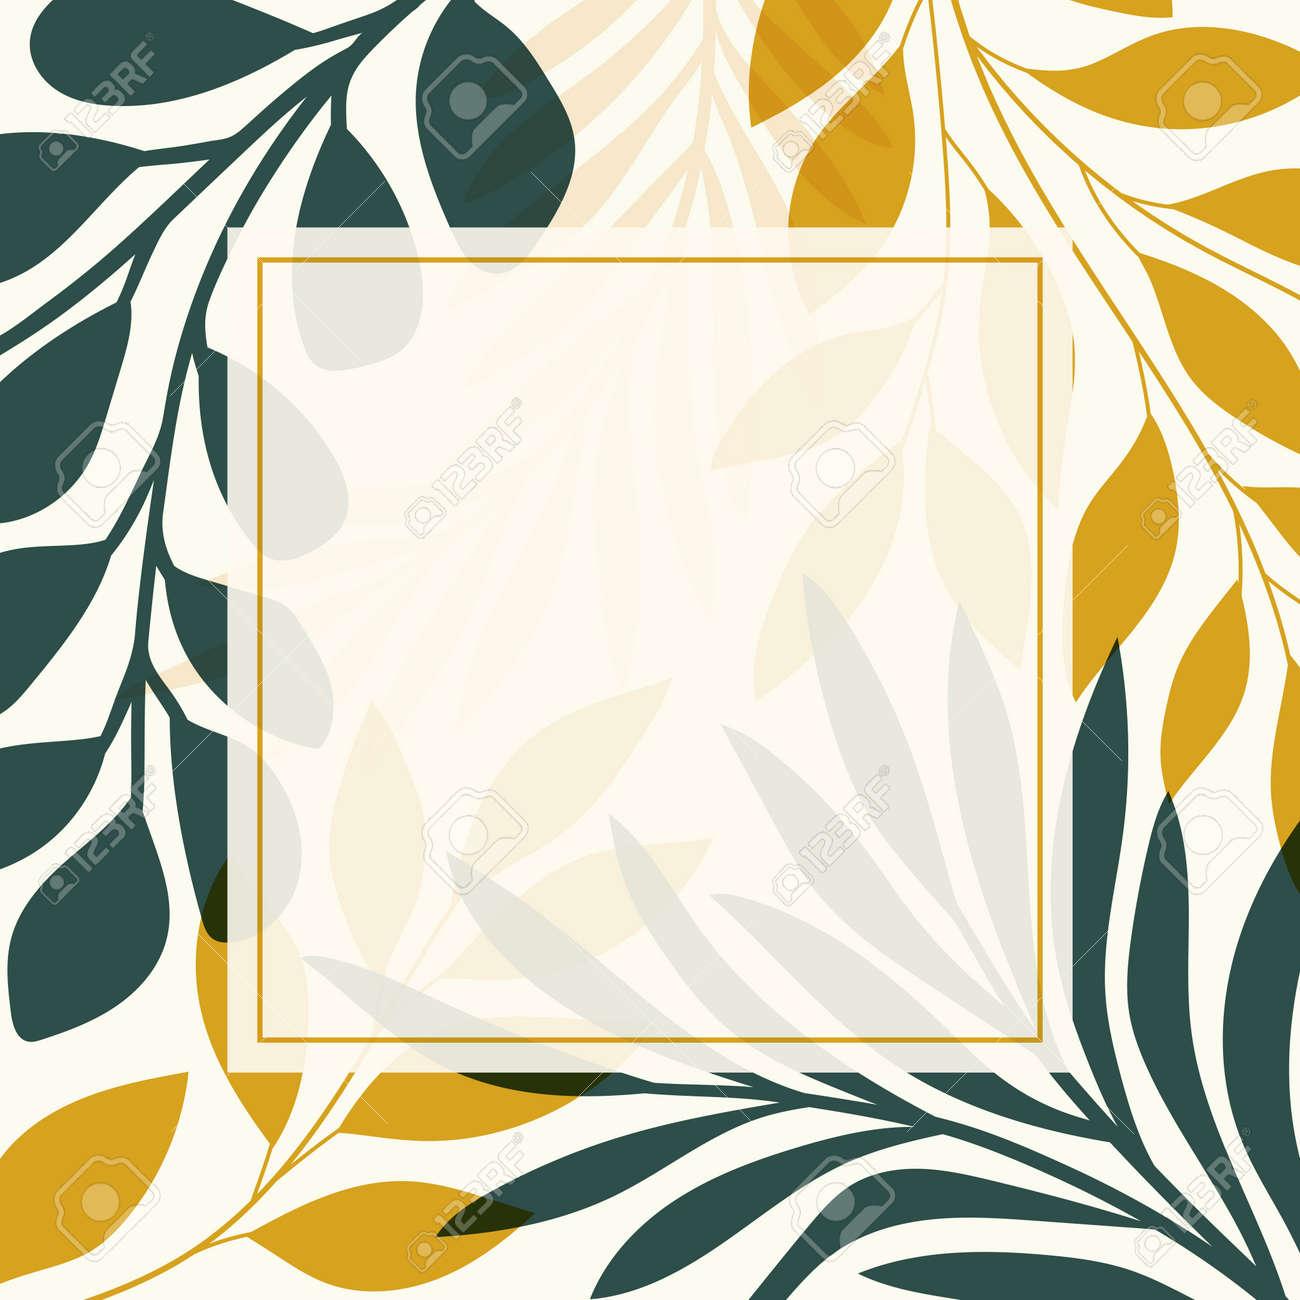 Modern floral vector banner. Botanical illustration template background. Abstract plant elements for print design, social media, post banner and presentation. - 168265308